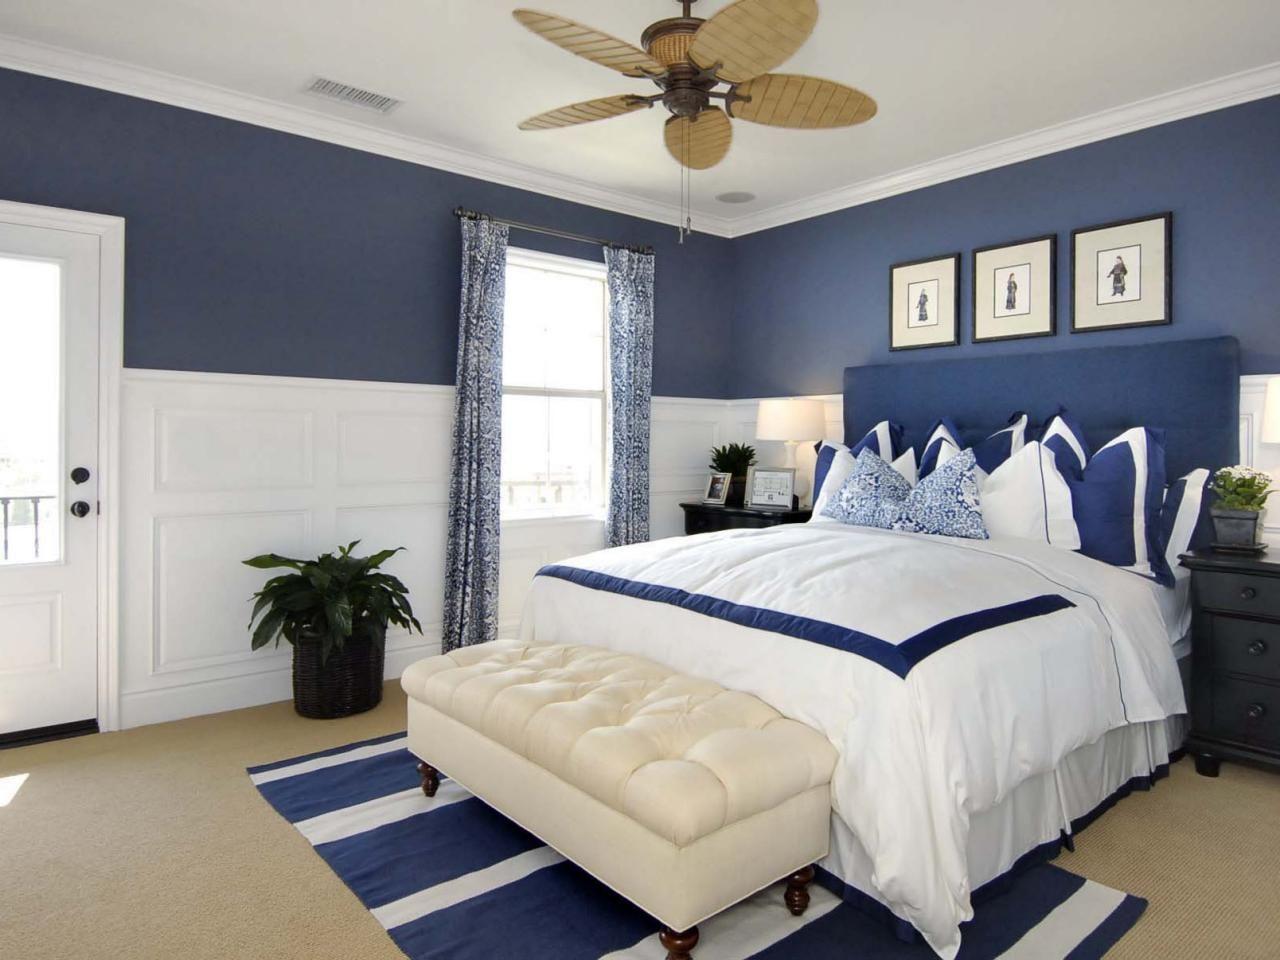 Camera Da Letto Blu Cobalto : No fail guest room color palettes bedroom camera